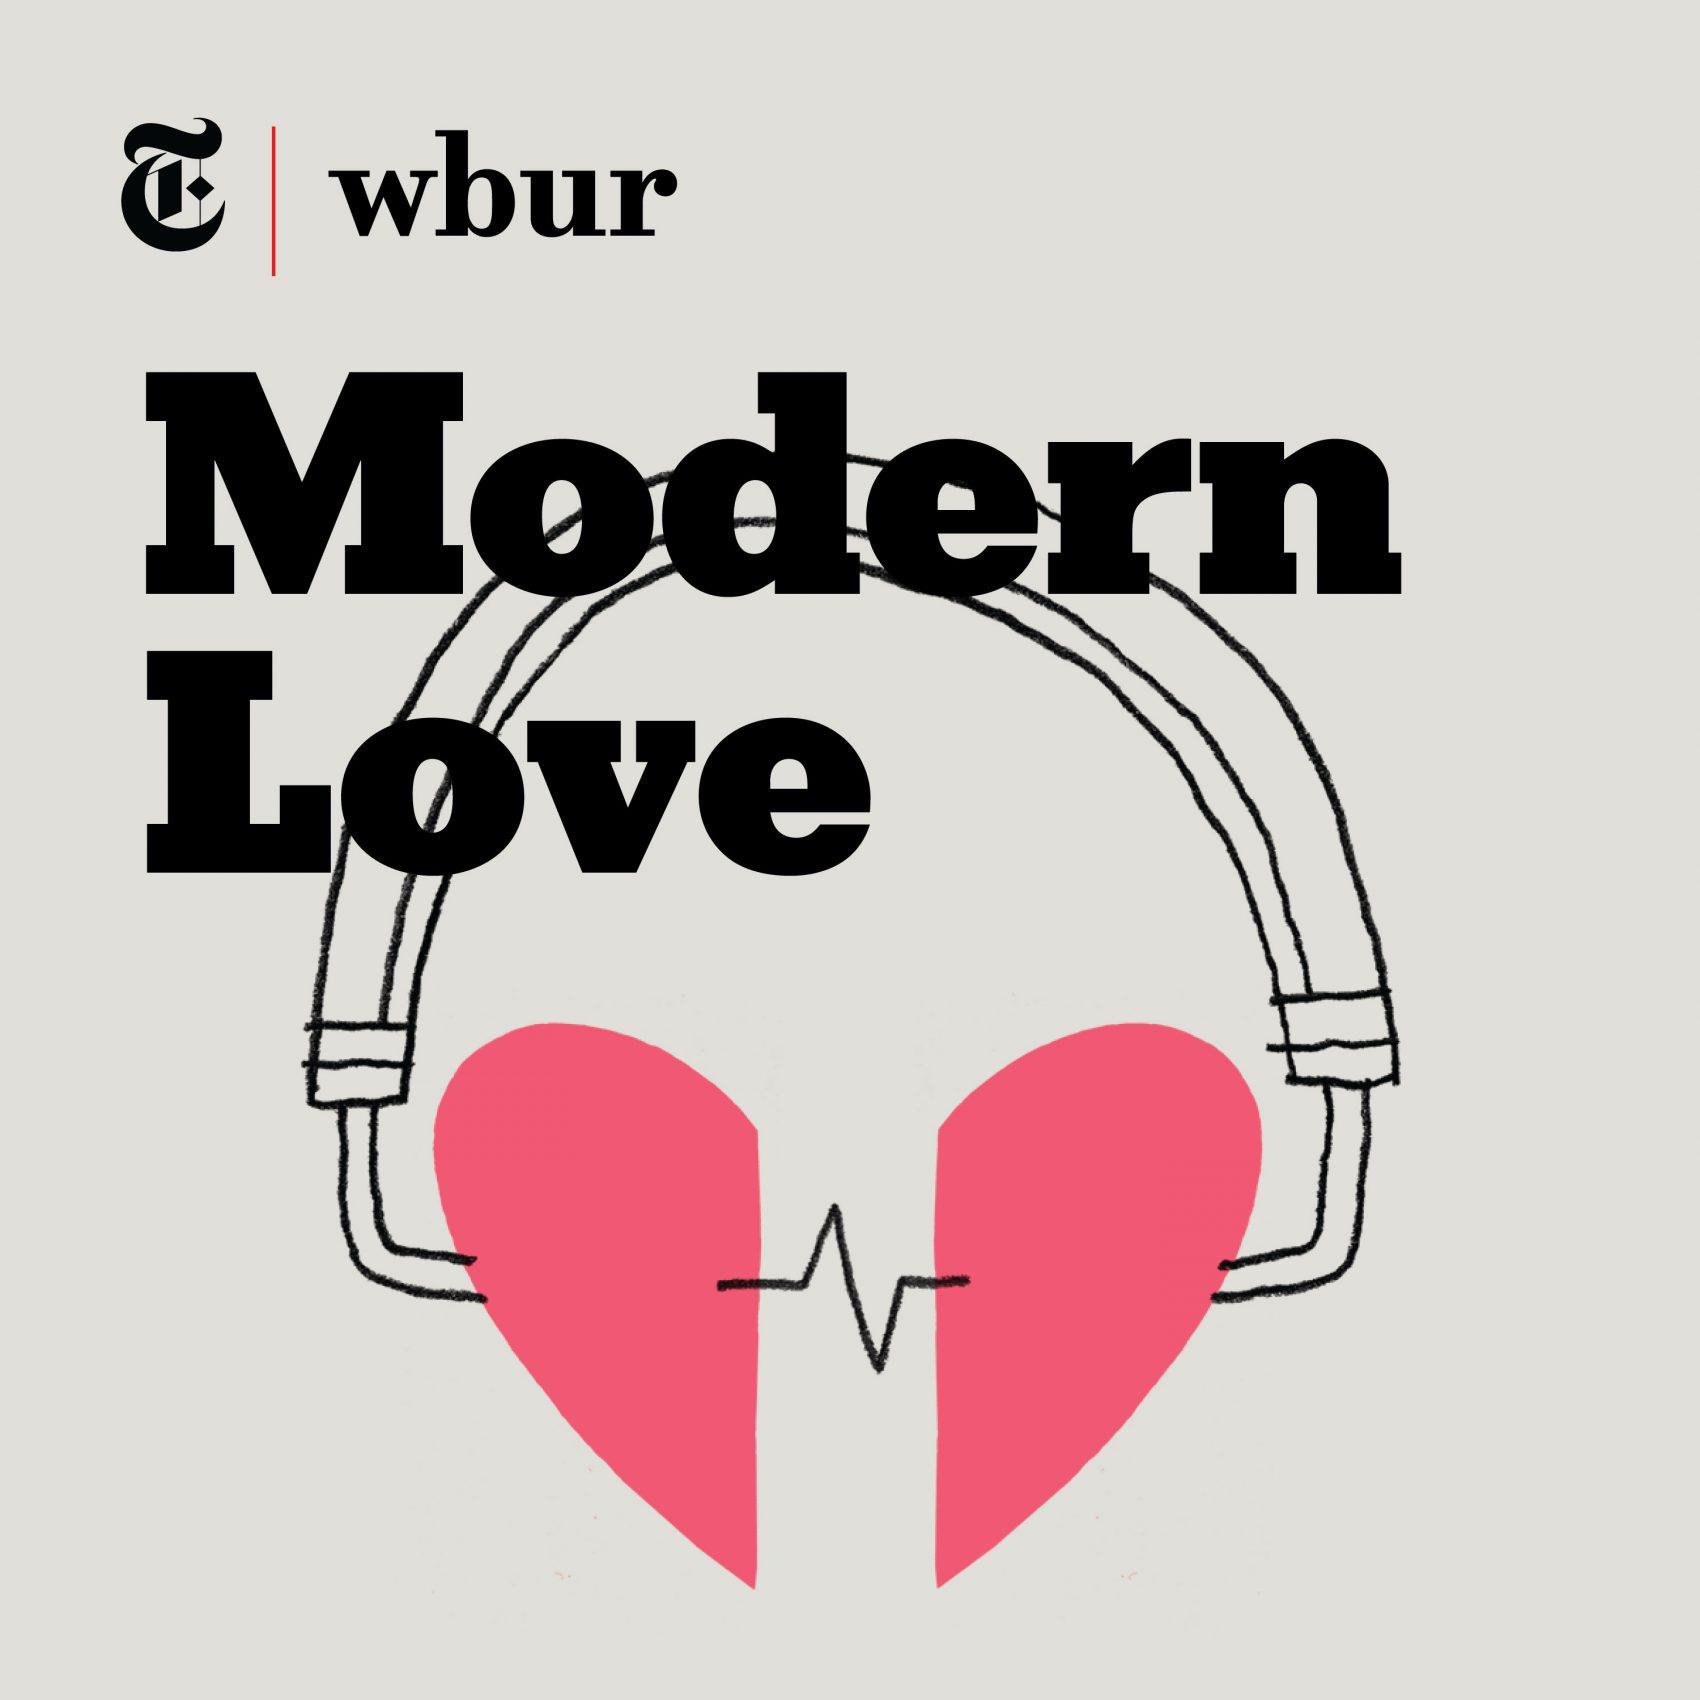 012 Tile Modern Love Essay Example College Impressive Contest 2016 Full